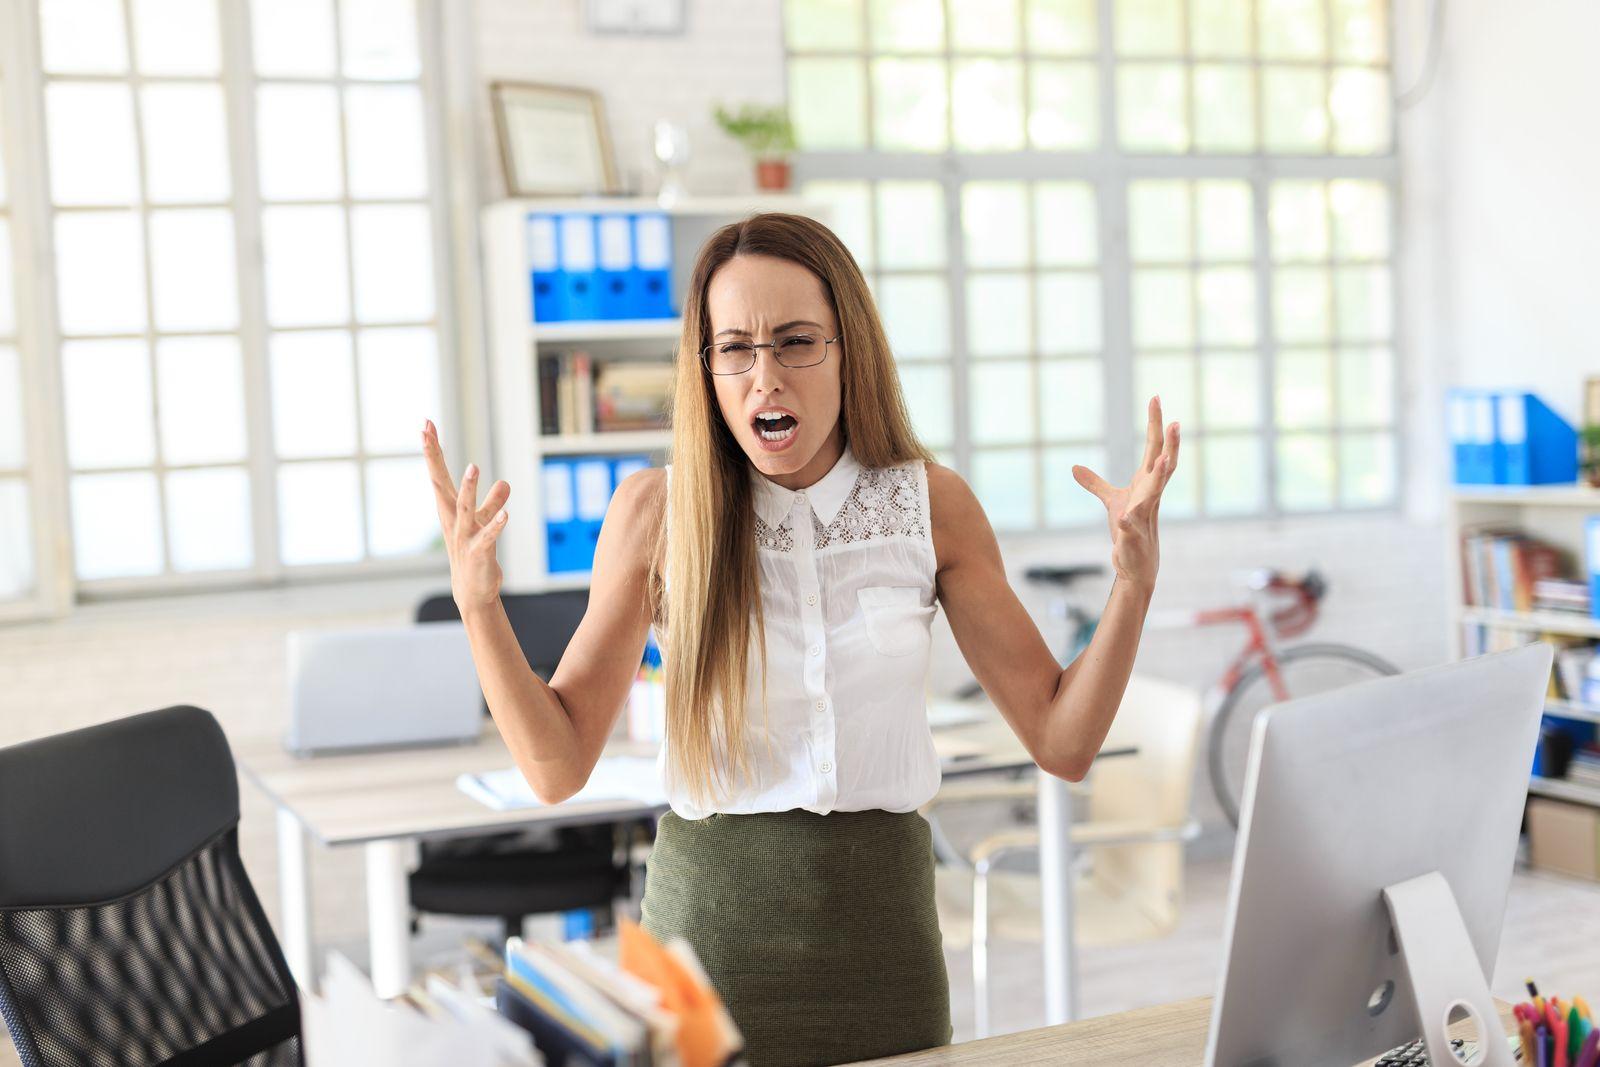 Furious businesswoman shouting at work